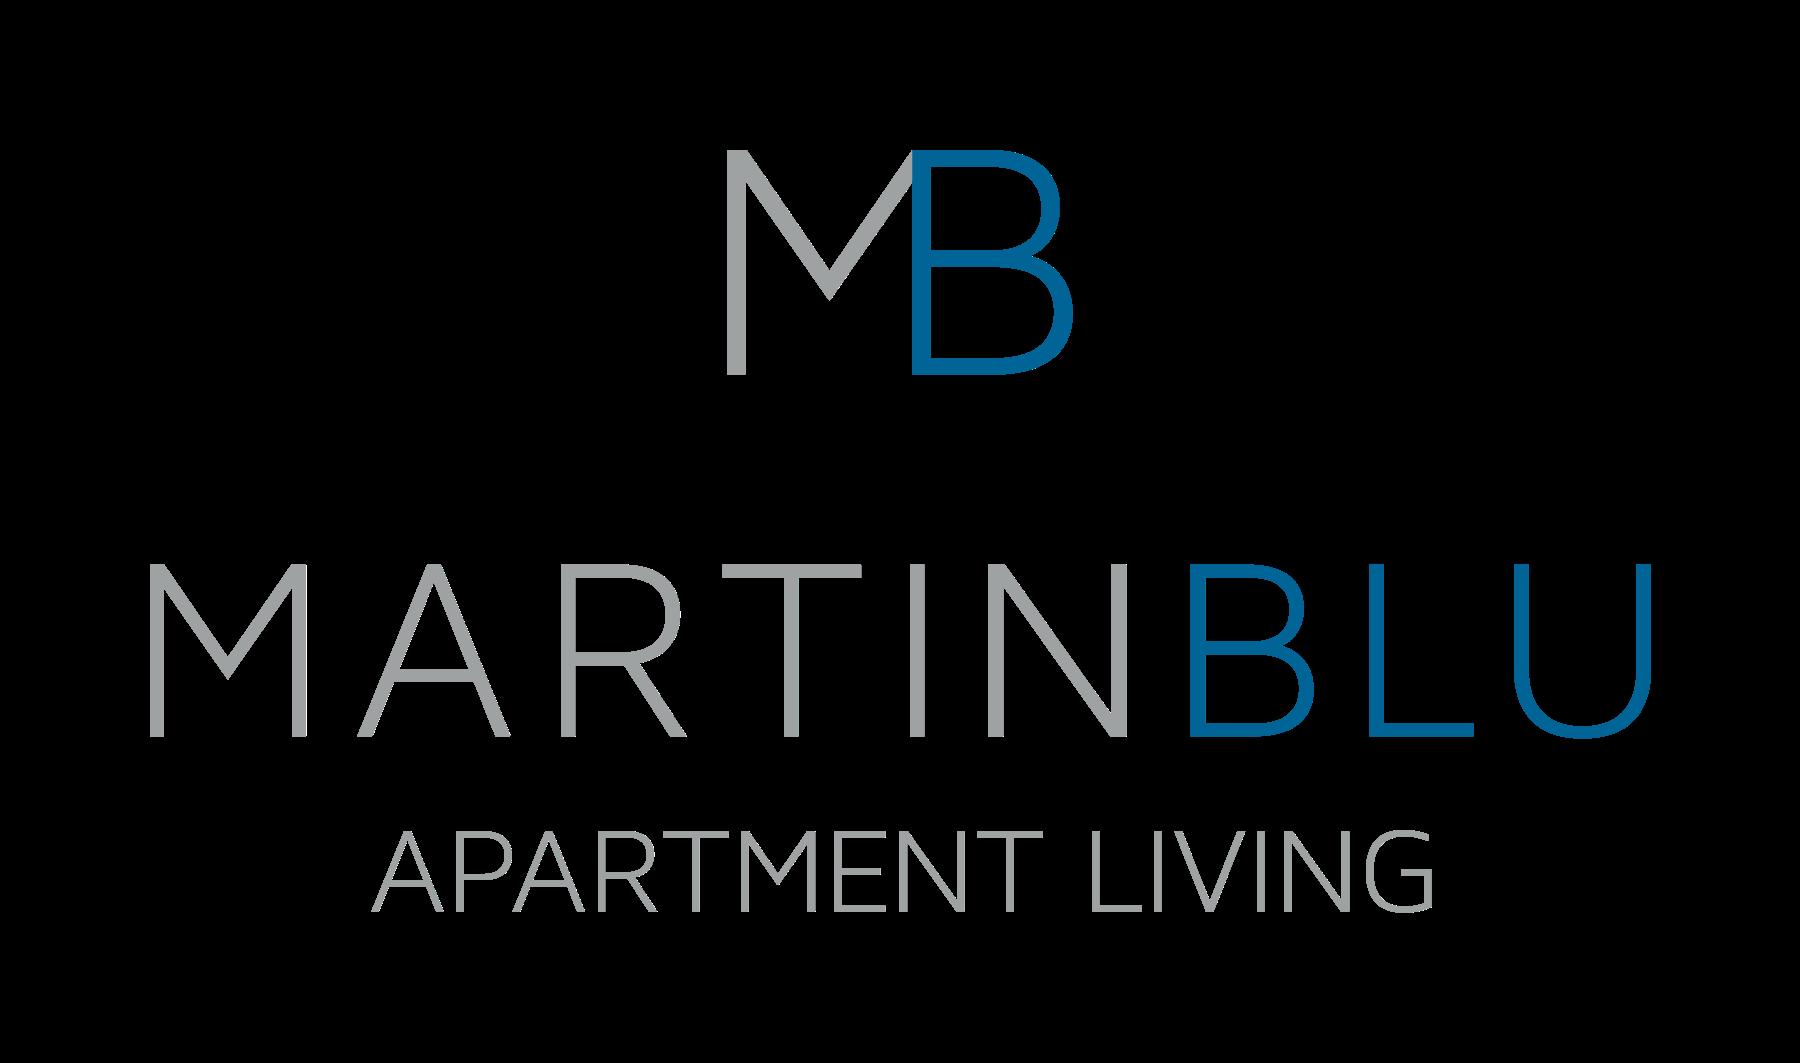 Martin Blu, Minnesota, 55344